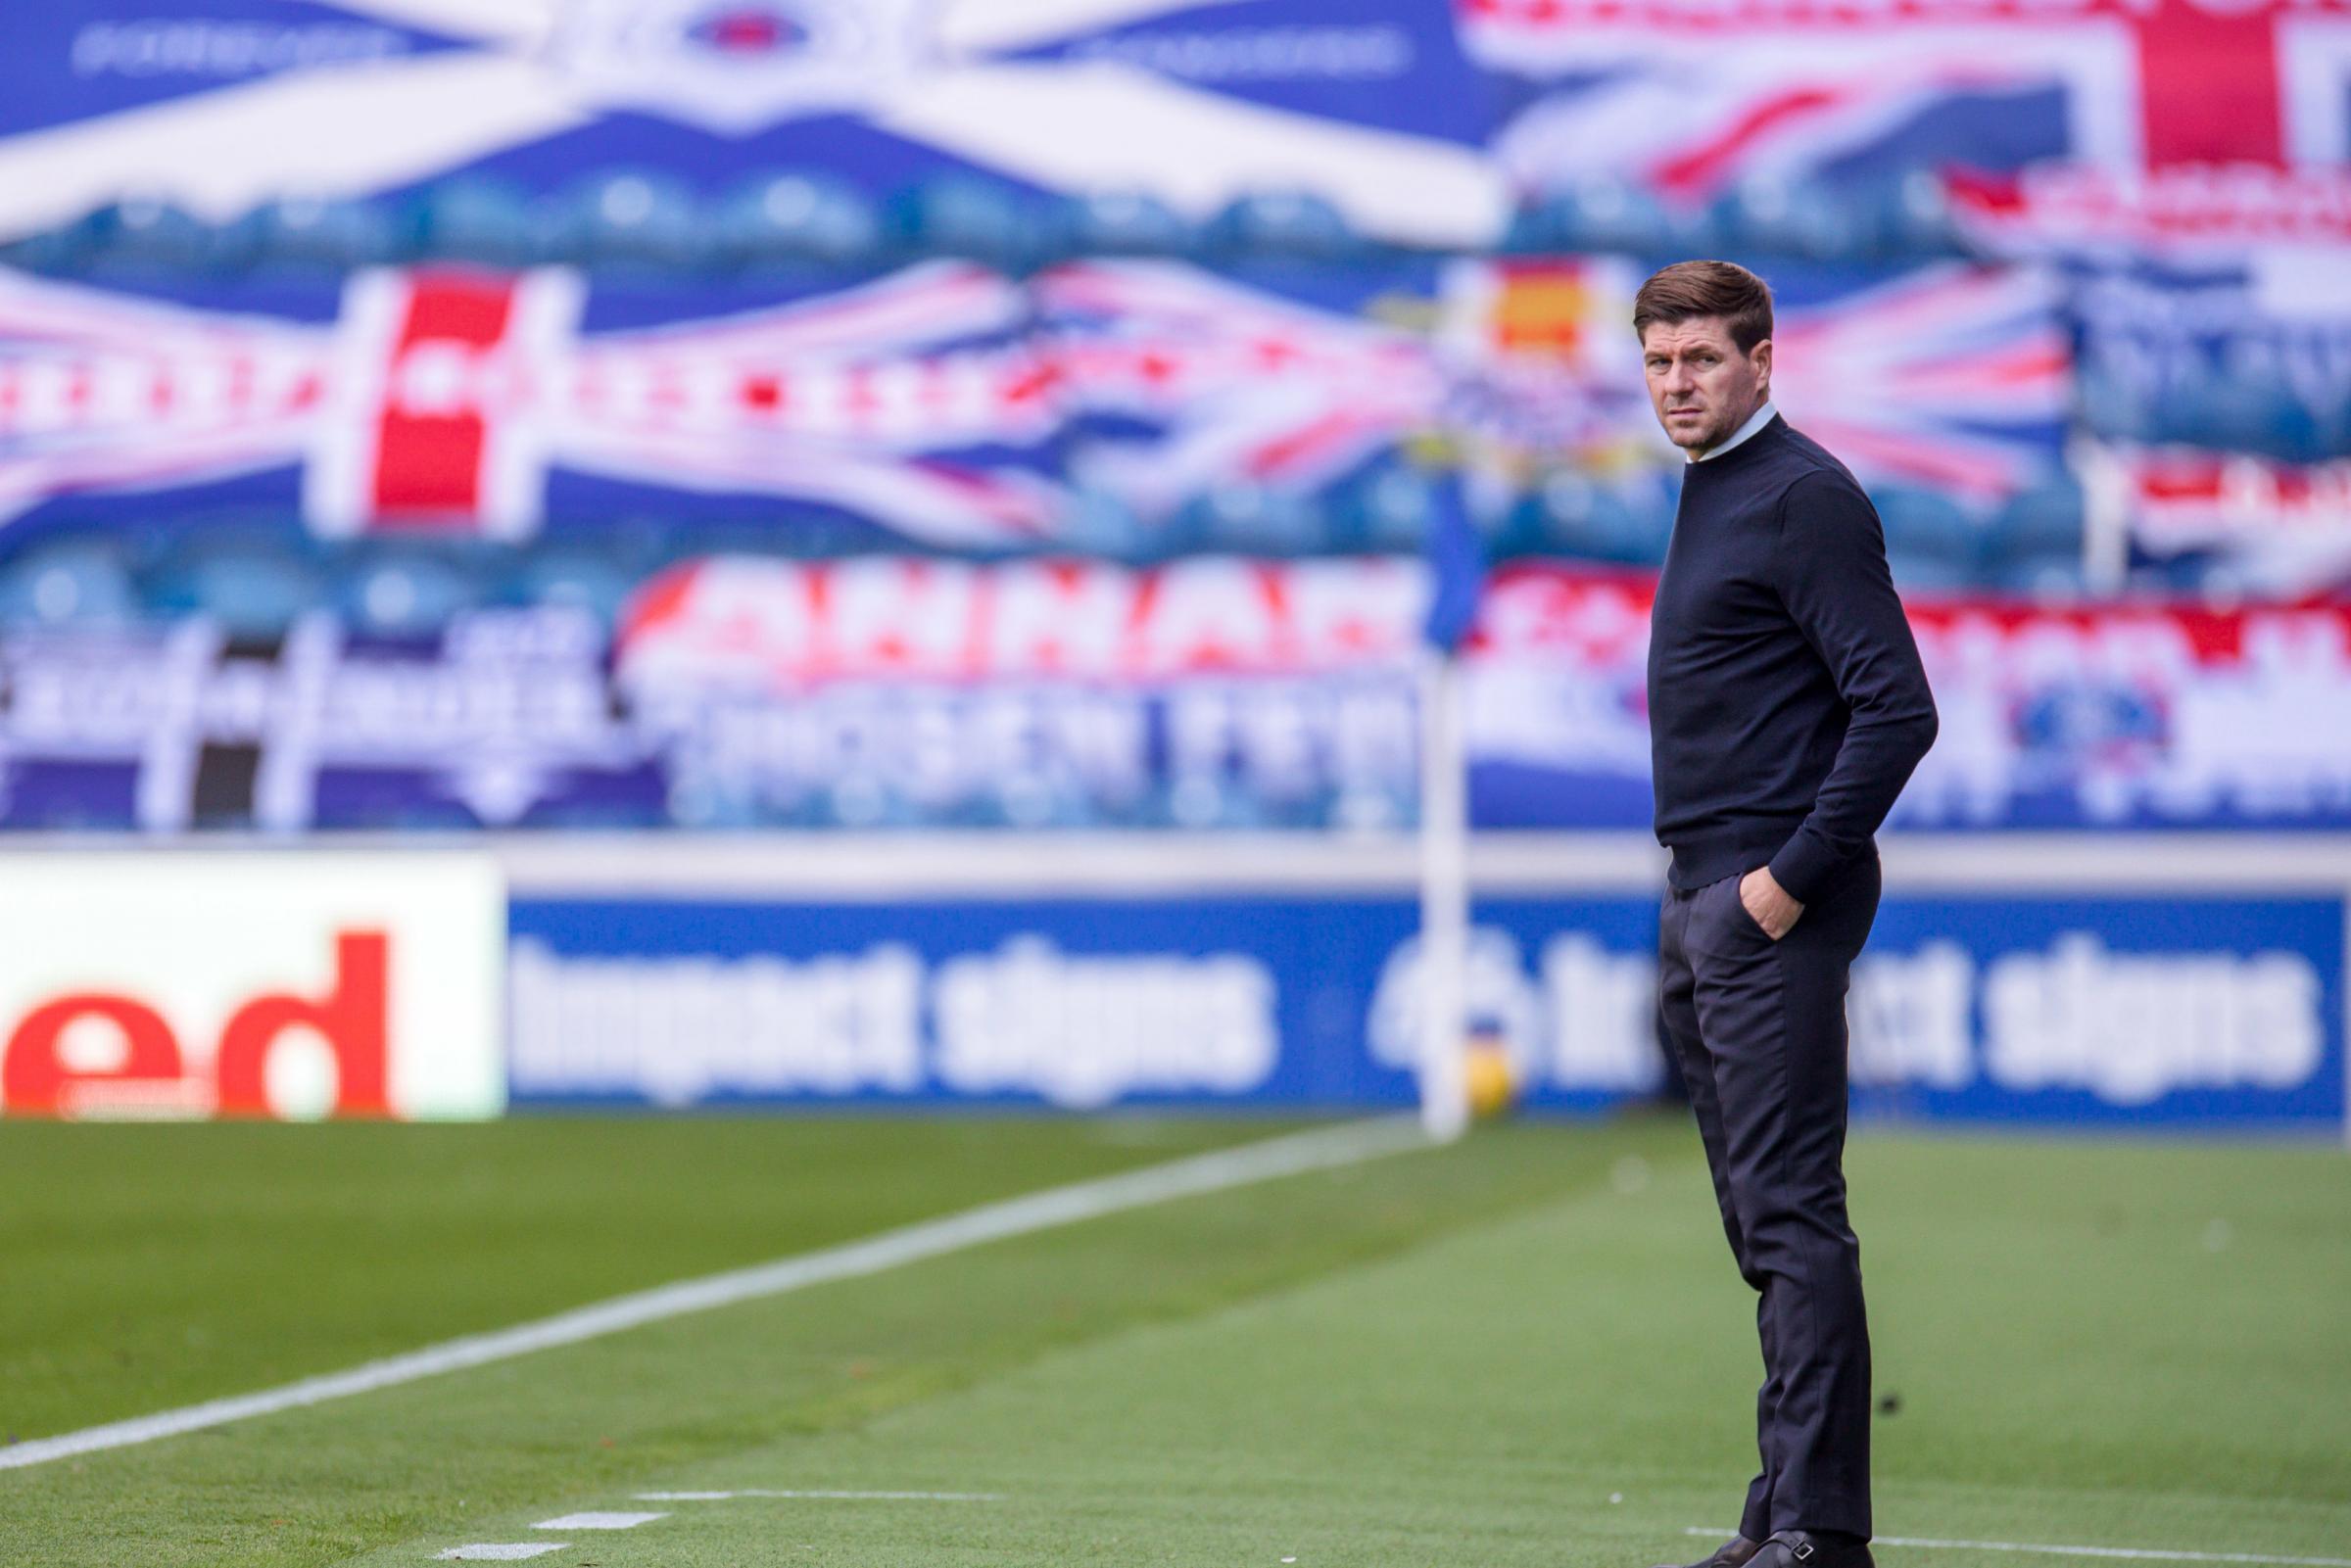 Steven Gerrard gives update on fitness of Rangers keeper Allan McGregor and praises Jon McLaughlin after Ibrox win